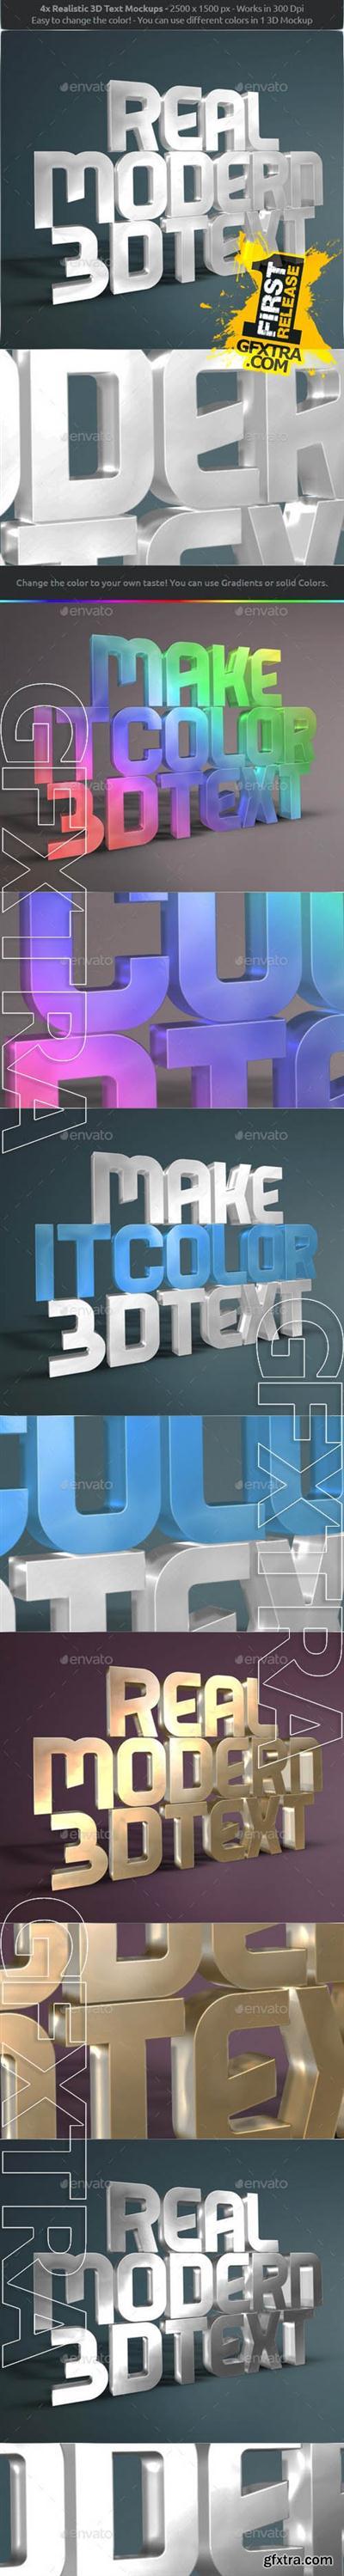 Graphicriver Real 3D Text Mockups V2 8888843